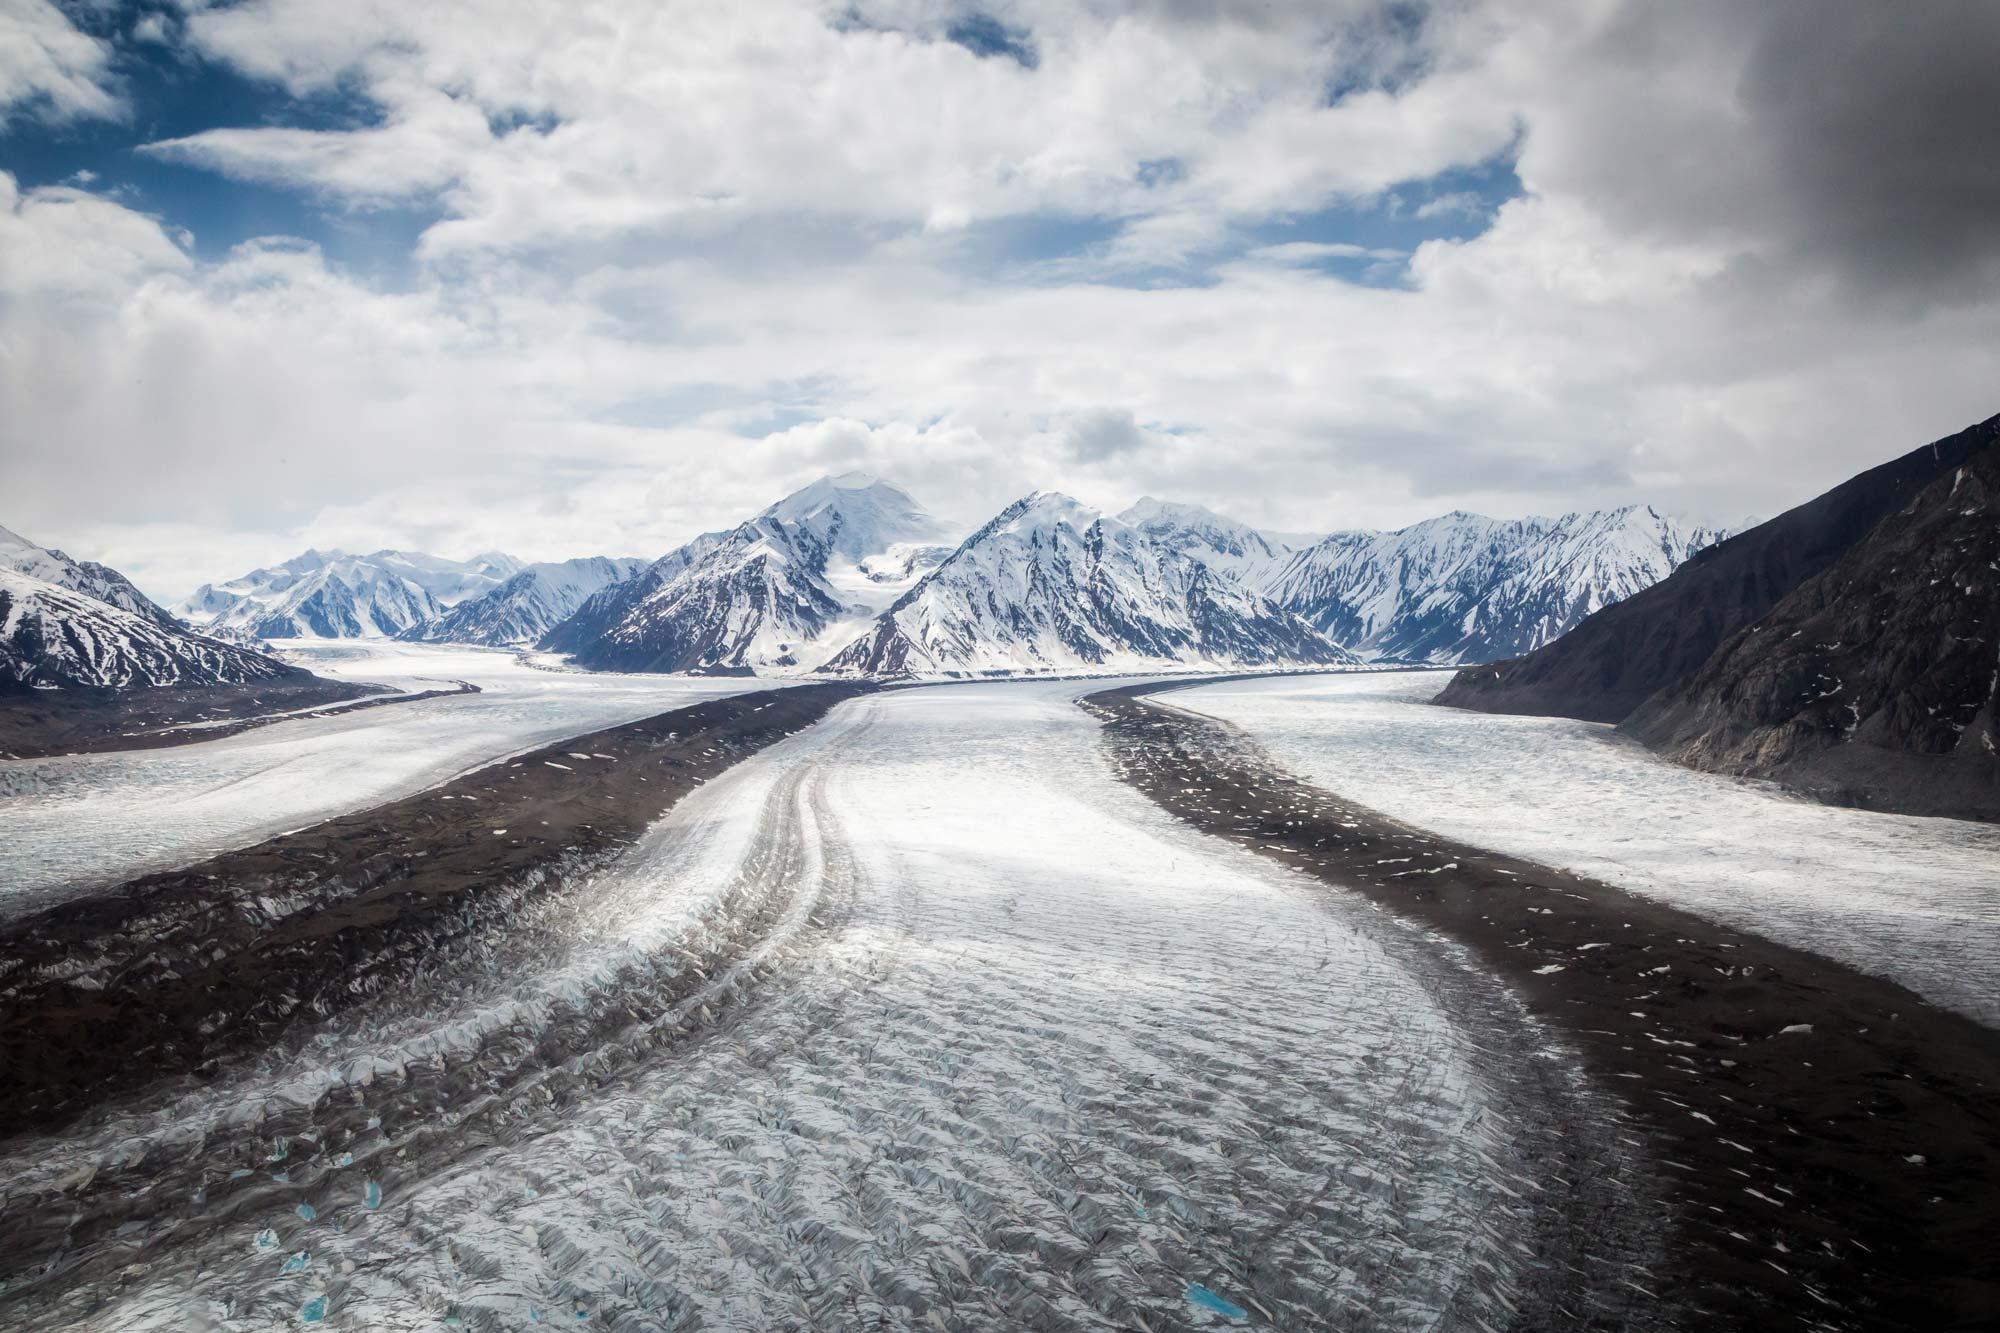 Kaskawulsh Glacier, Kluane, Yukon